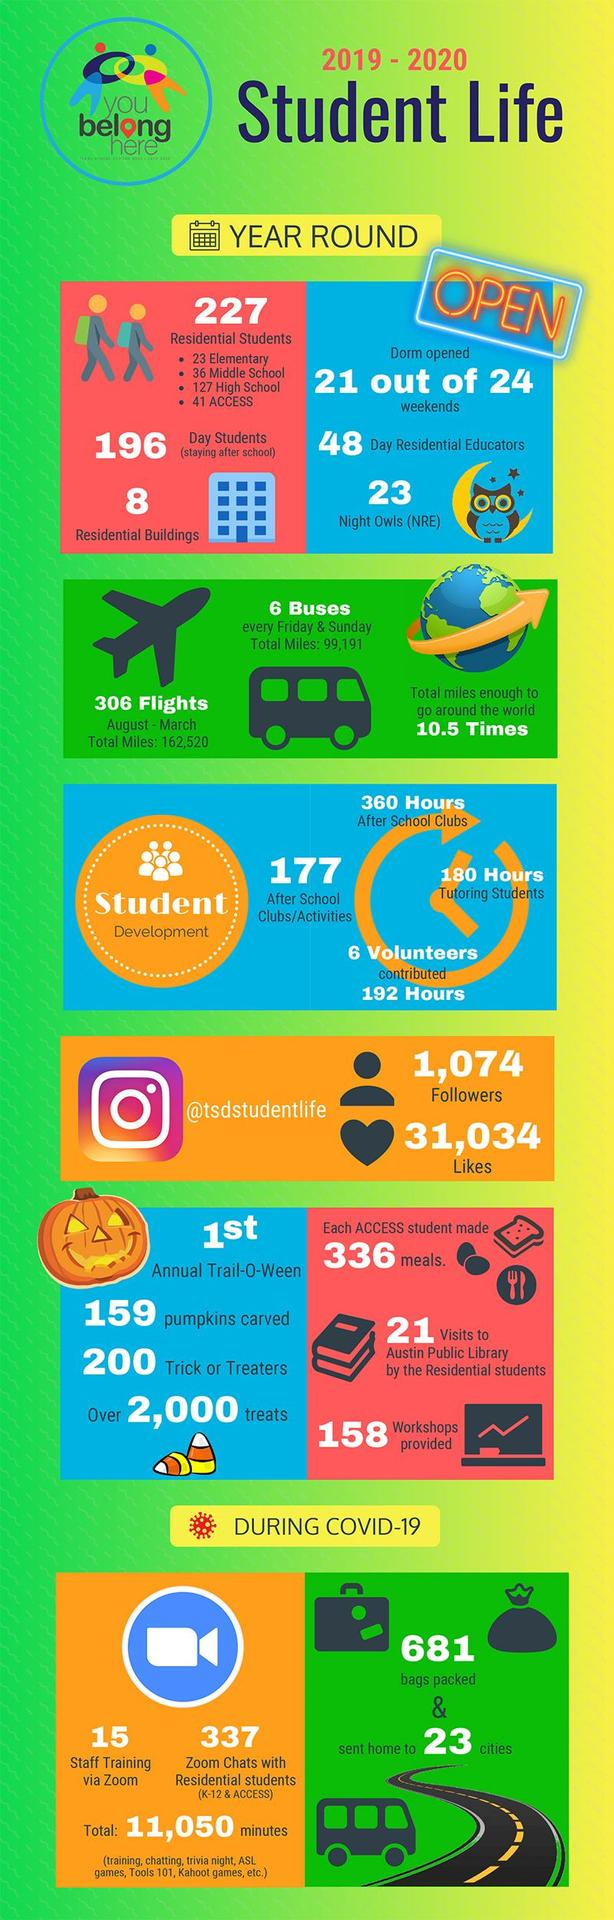 Student Life Infographic